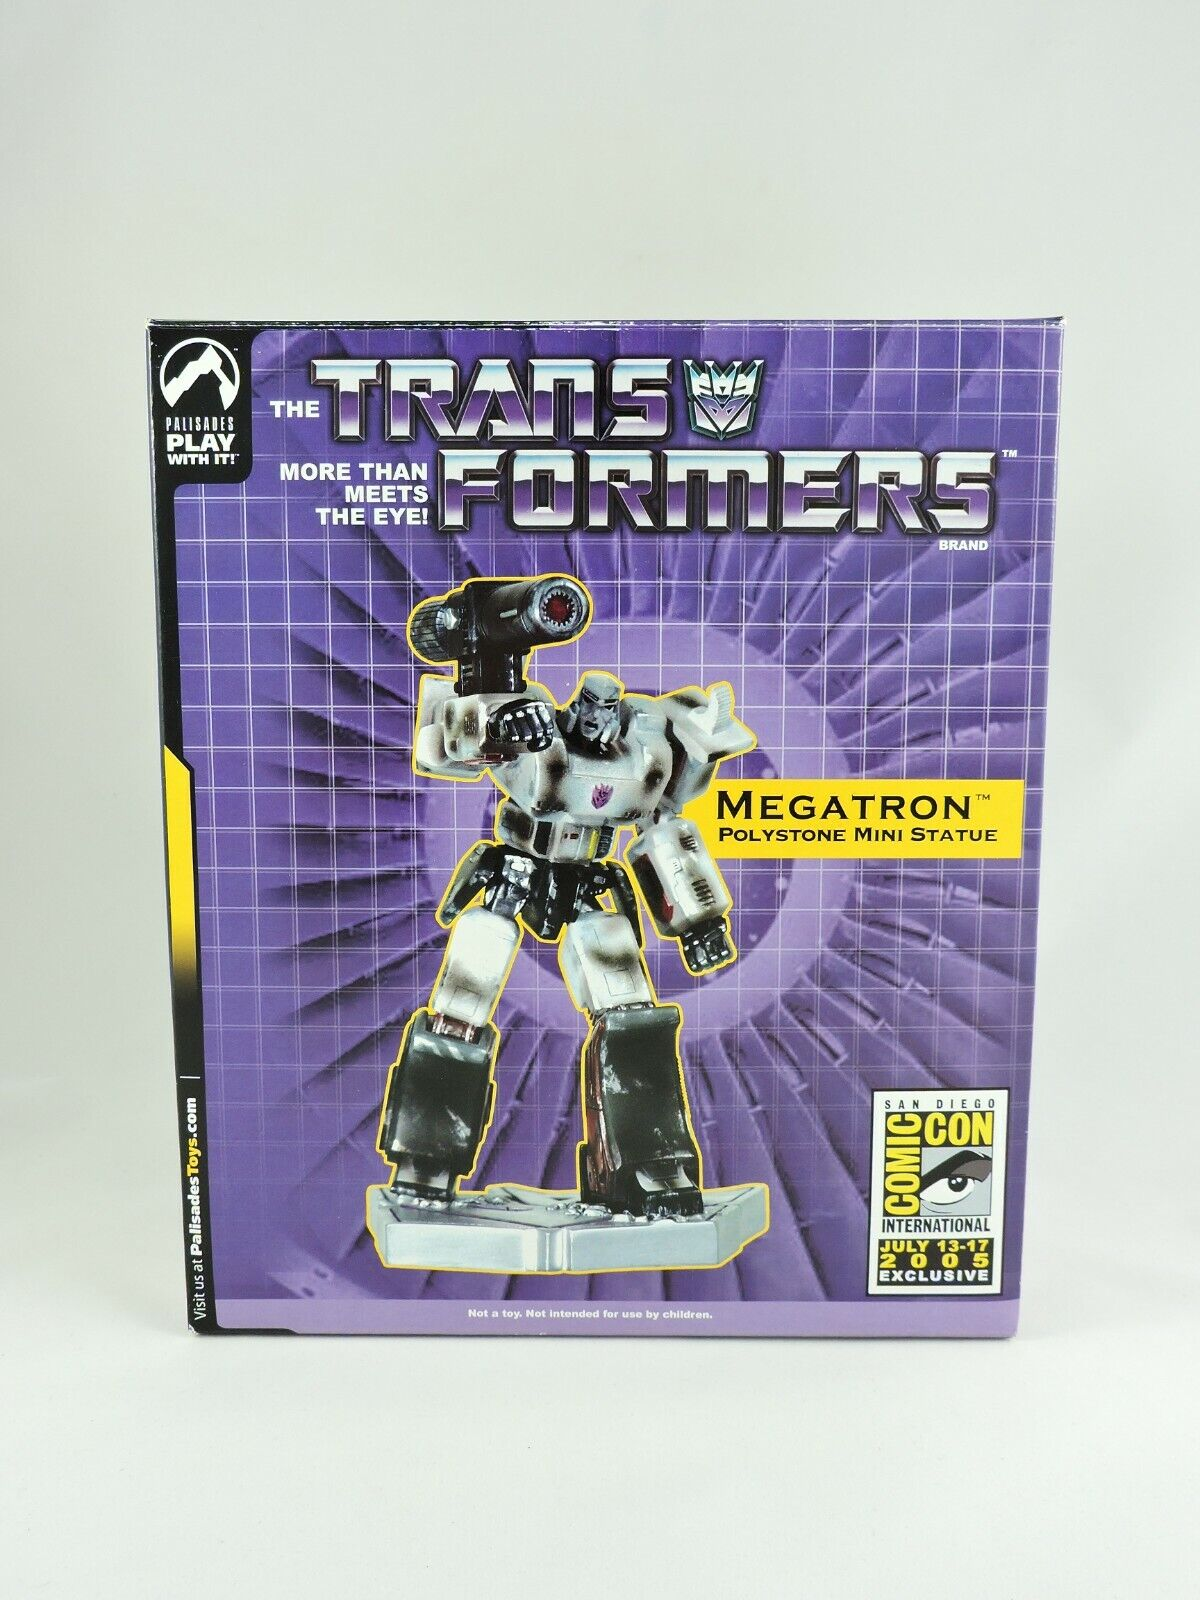 Megatron Polystone Statue Transformers 2005 San Diego comic-con Artist Proof 34 120 Palisades 6